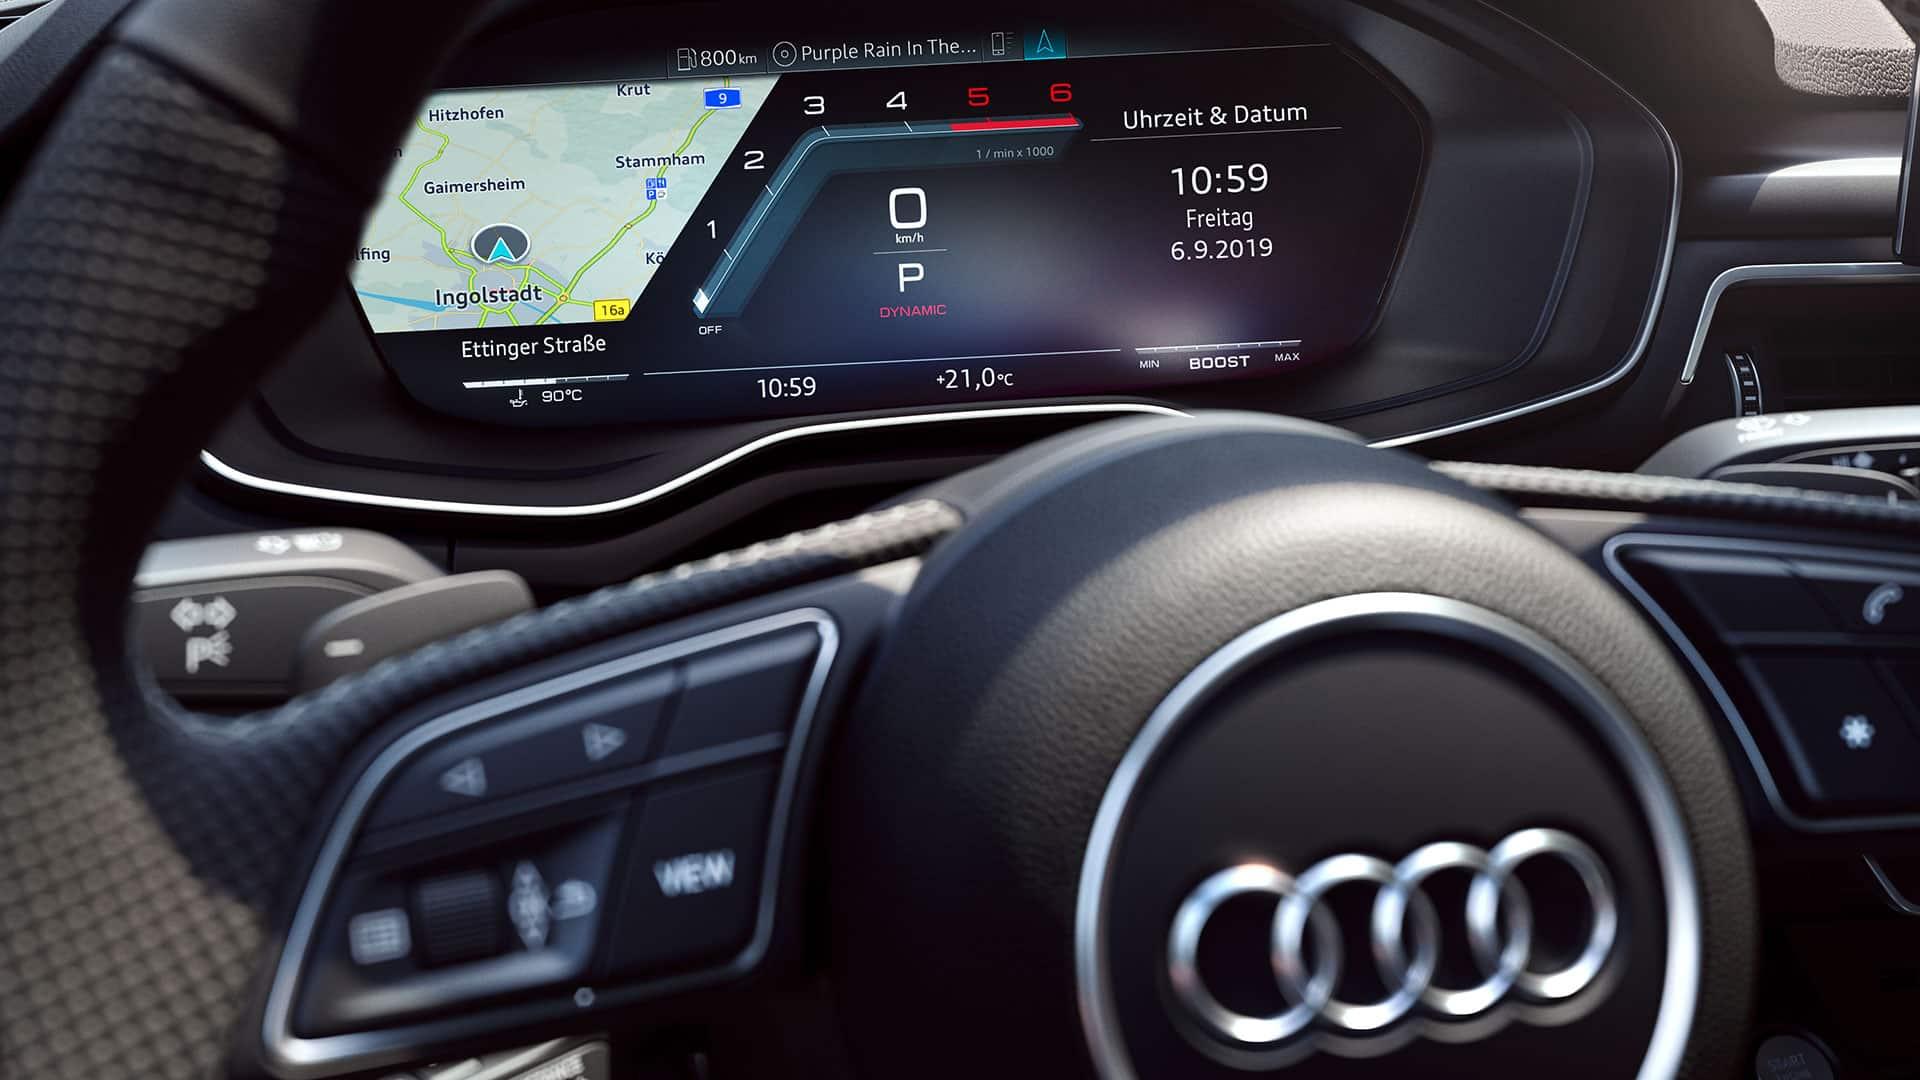 2020 Audi Rs5 Tdi Wallpaper